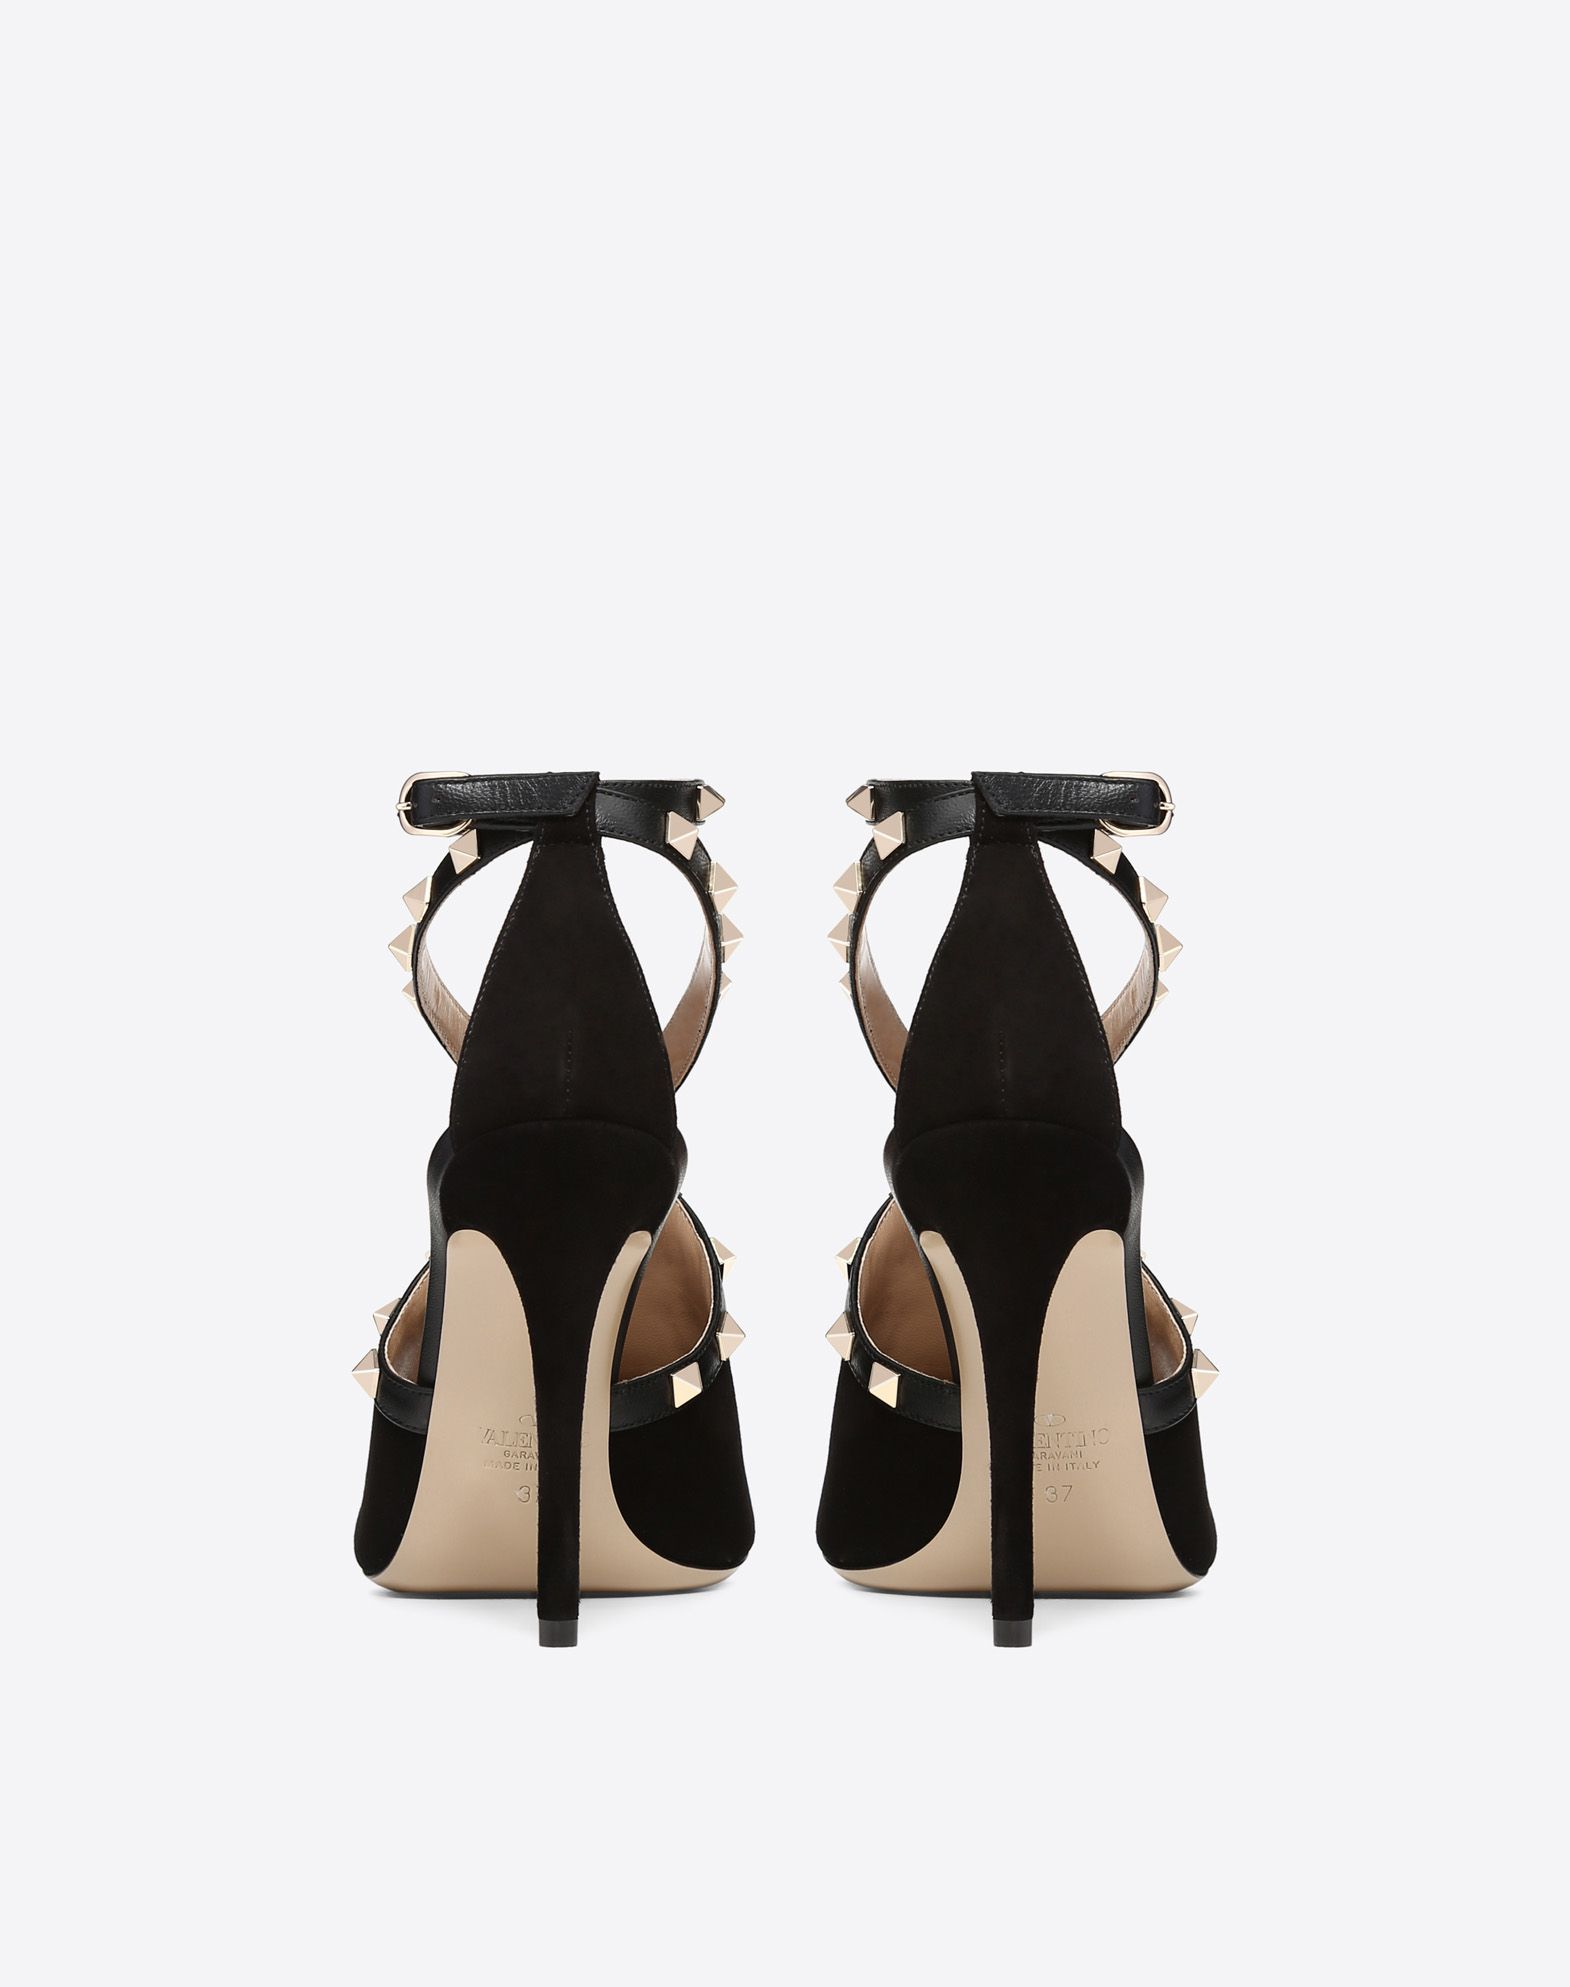 VALENTINO GARAVANI Rockstud Sandal HIGH HEEL SANDALS D d